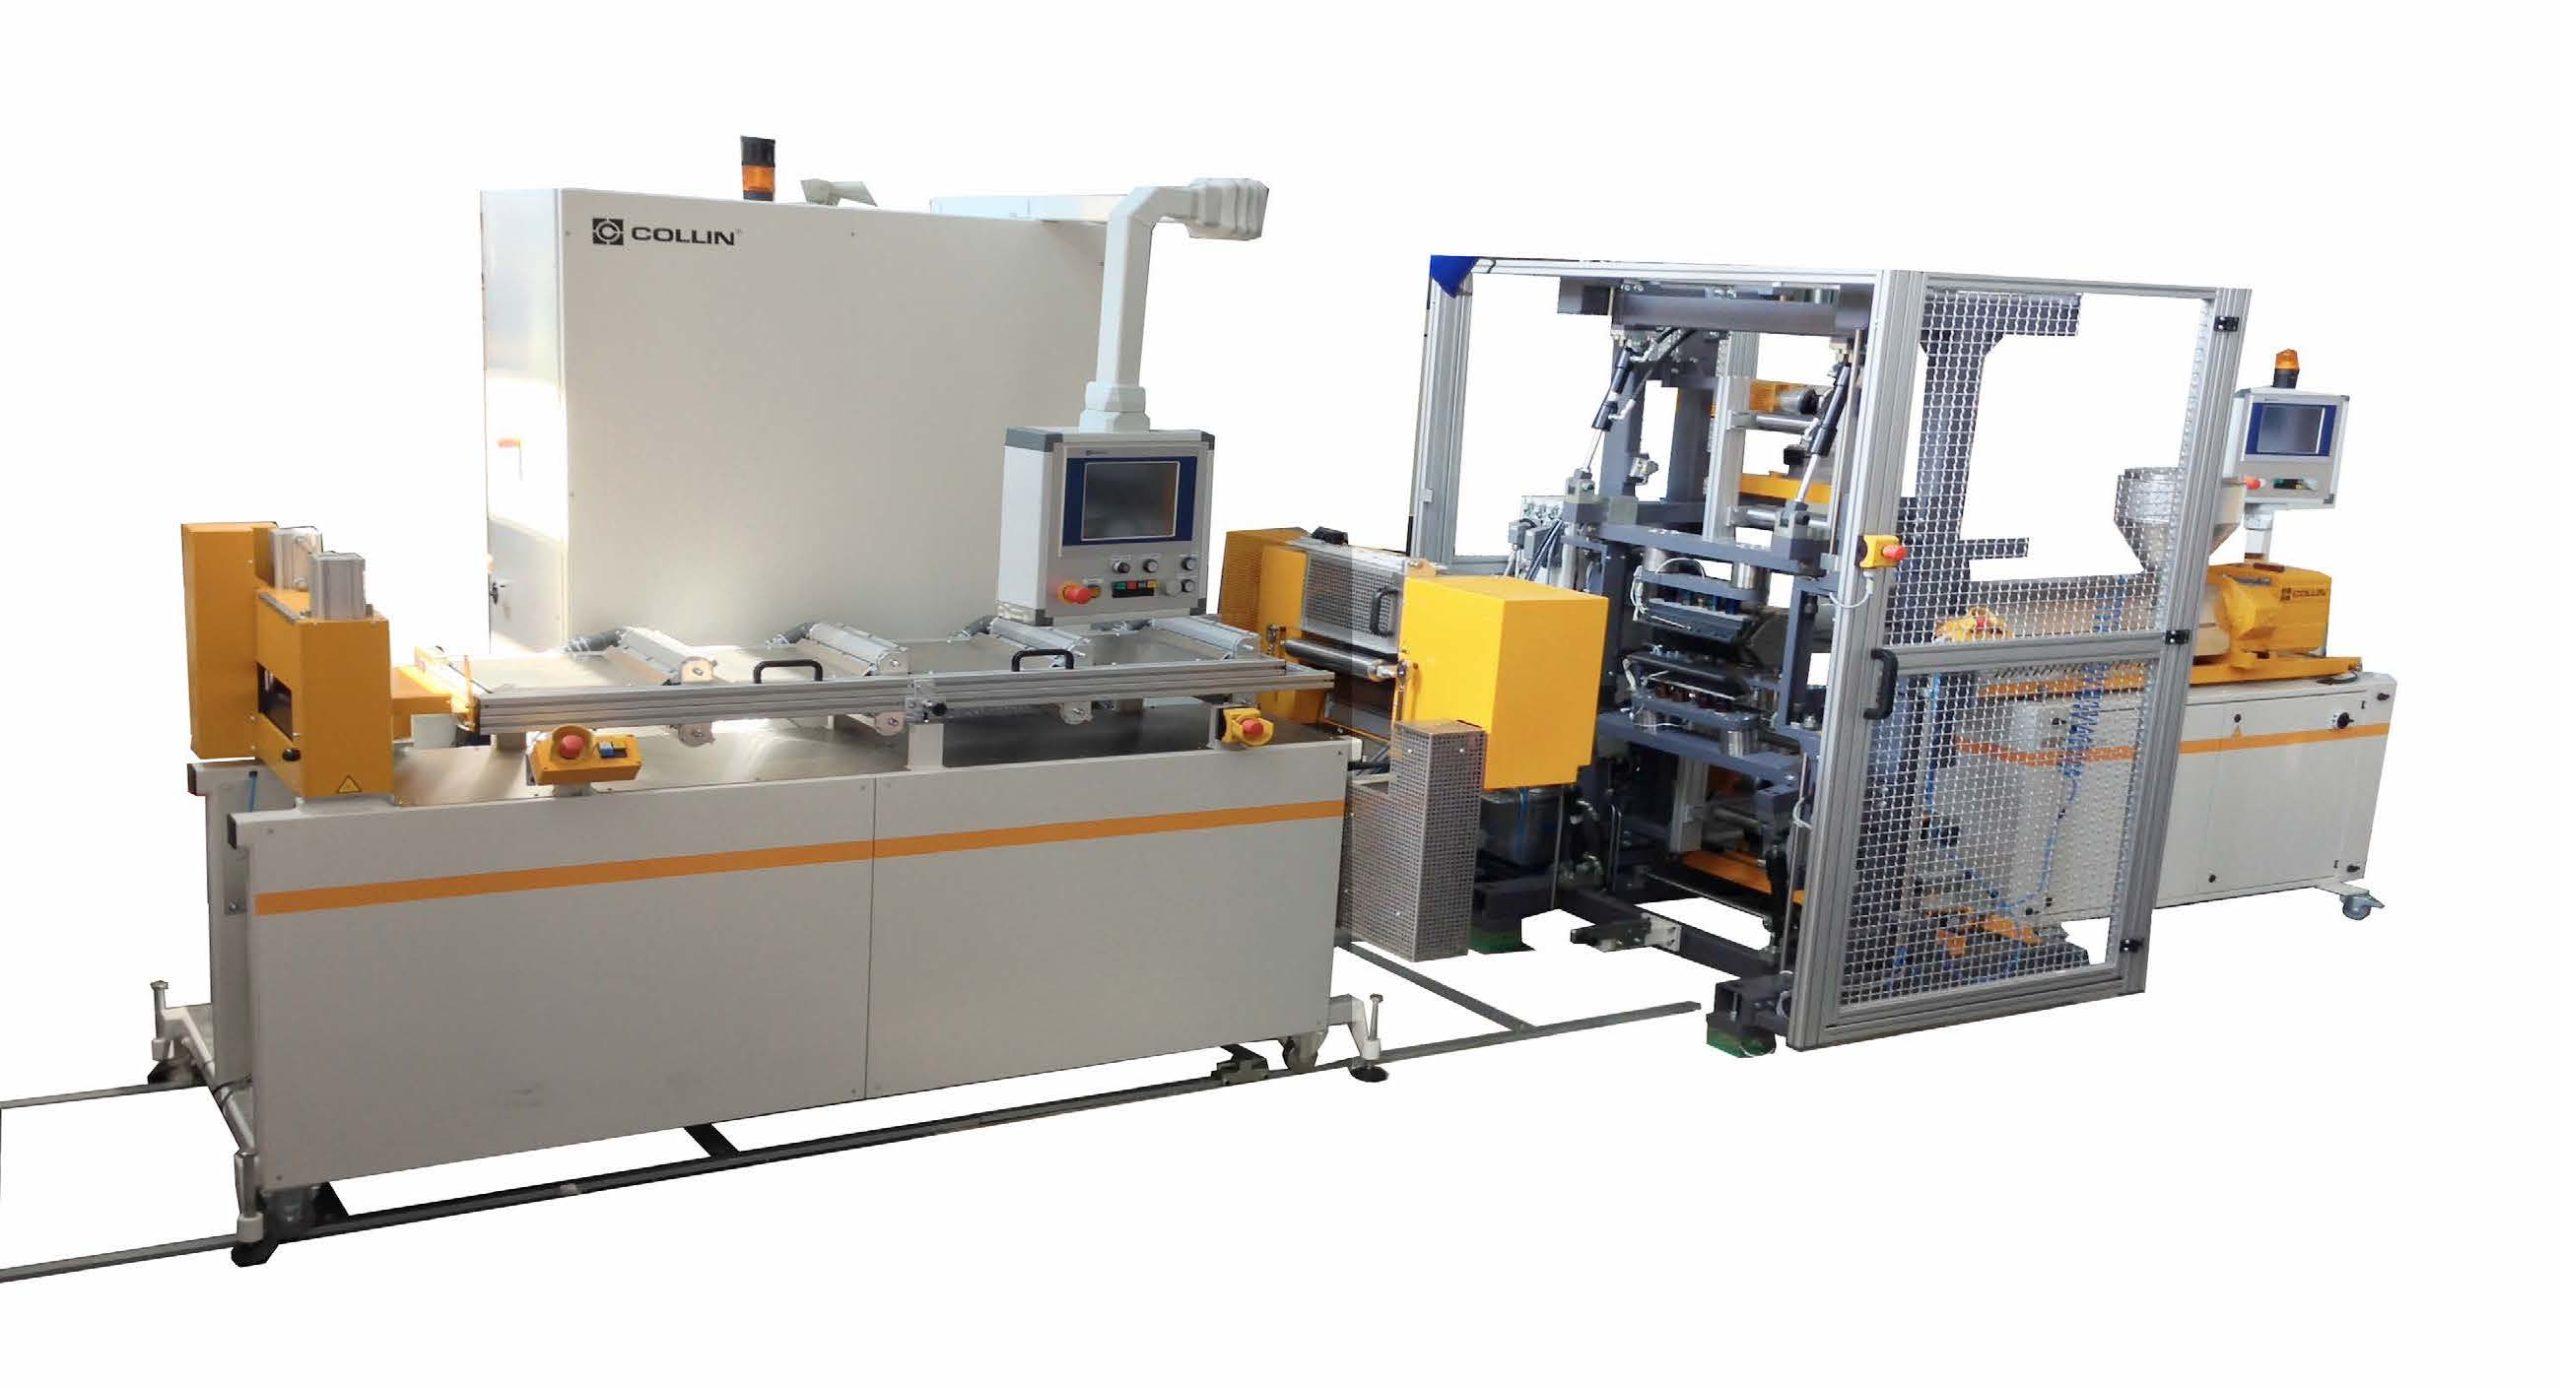 Lamipreg-Anlage | Polymer Engineering Bayreuth